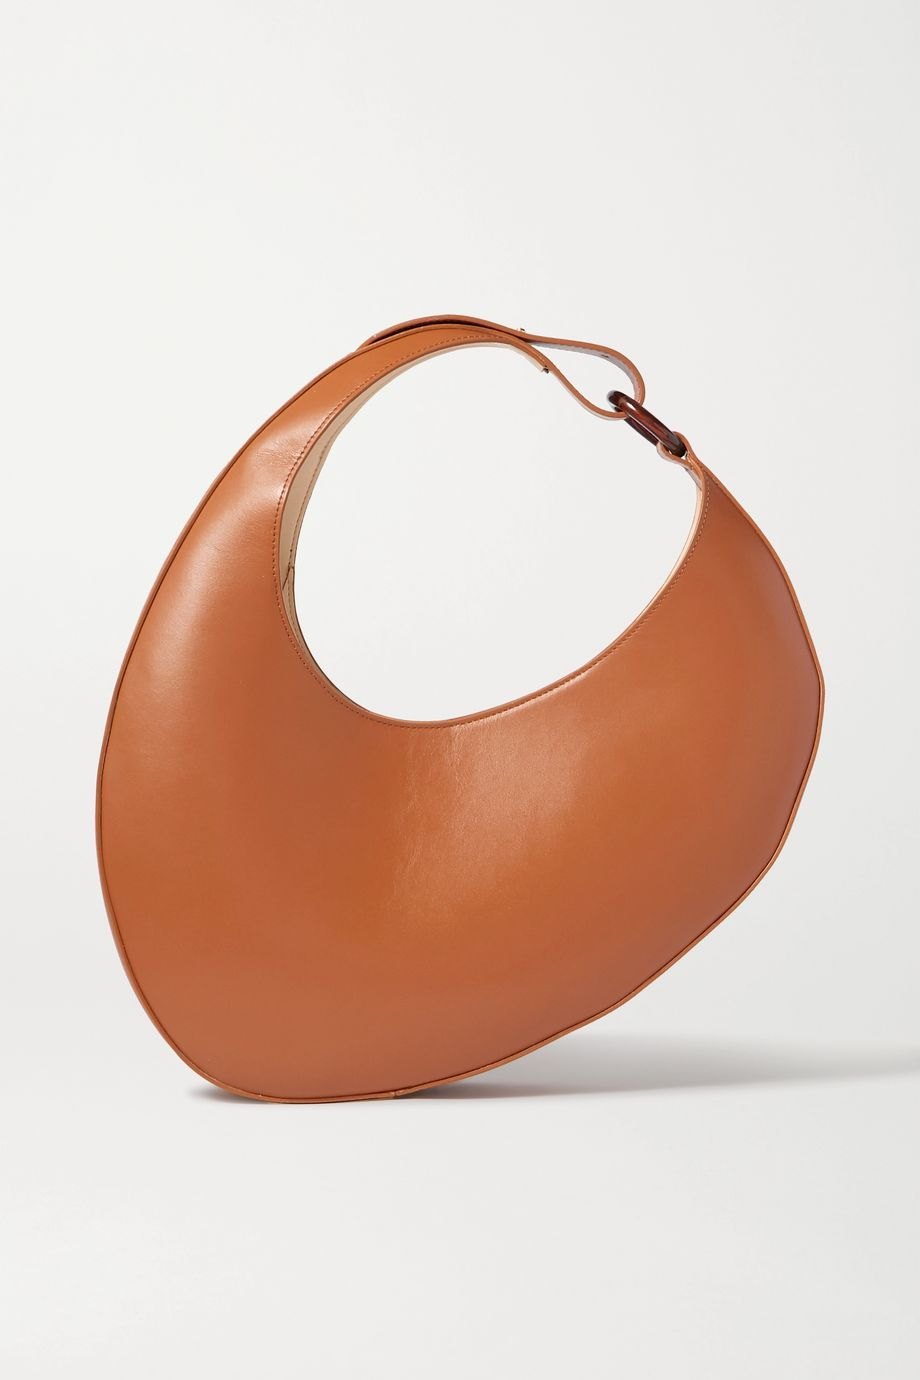 Carolina Santo Domingo Ostra leather shoulder bag